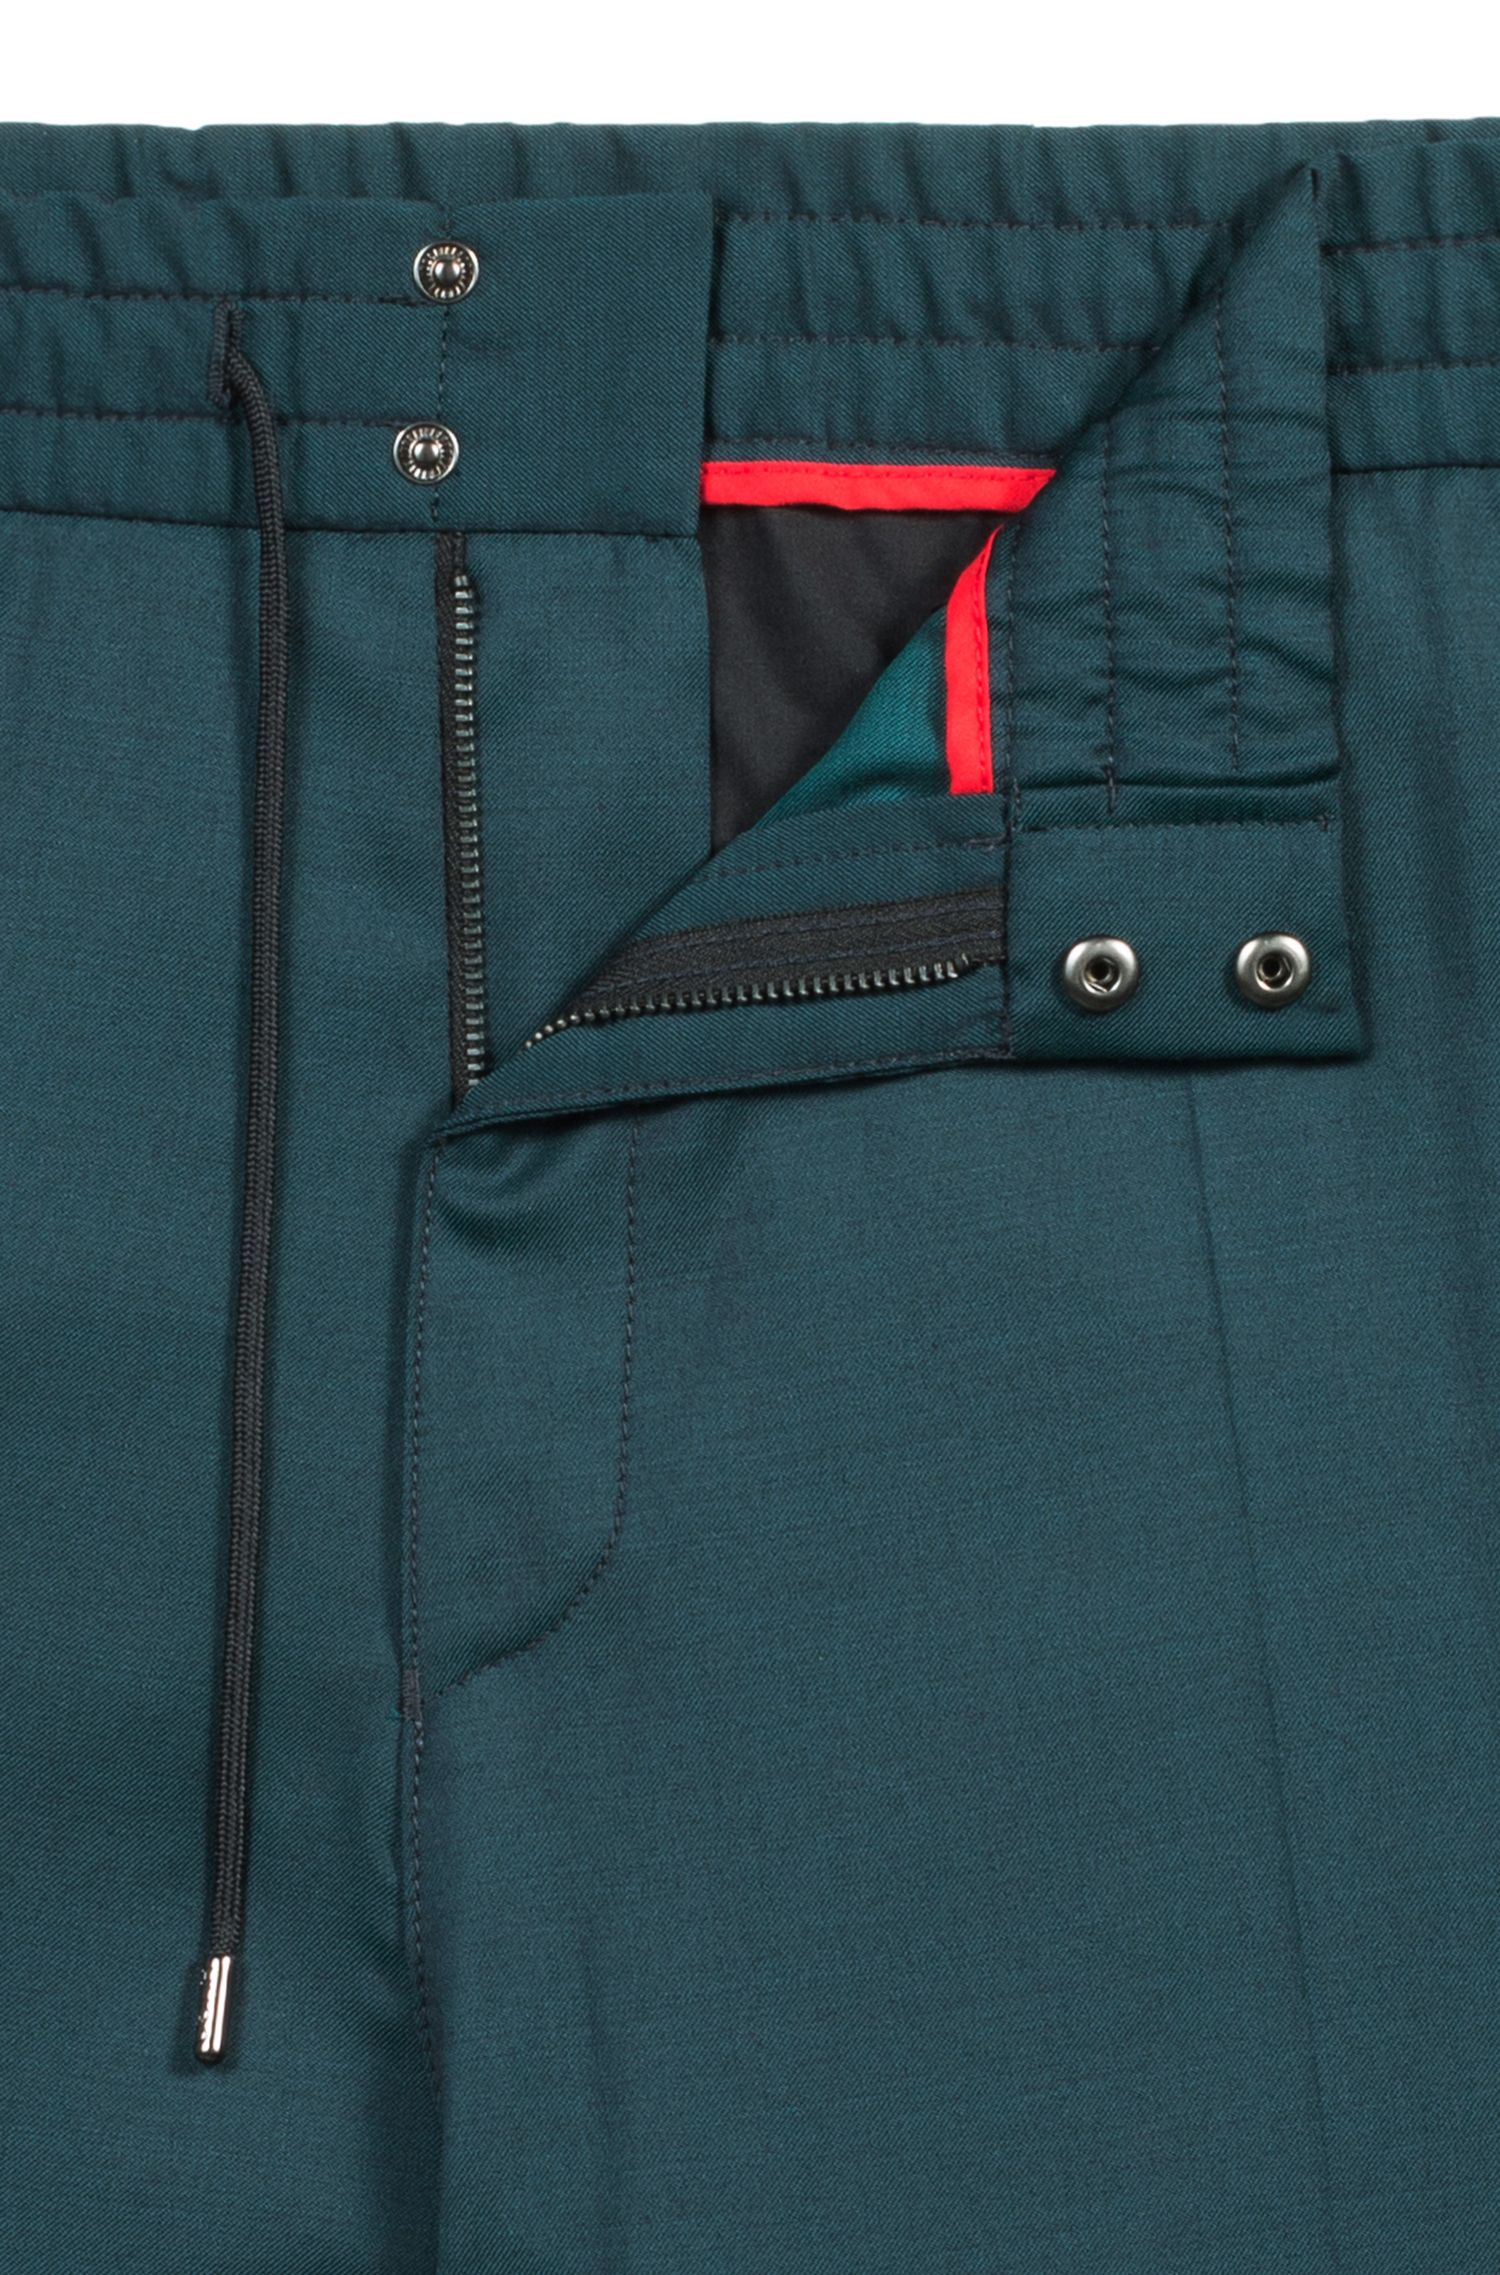 Pantaloni tapered fit in lana vergine con elasticità naturale, Verde scuro